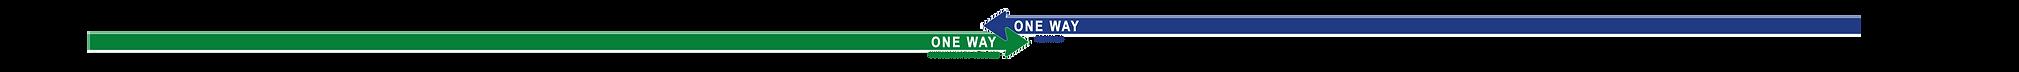 LogoBarNav2.png